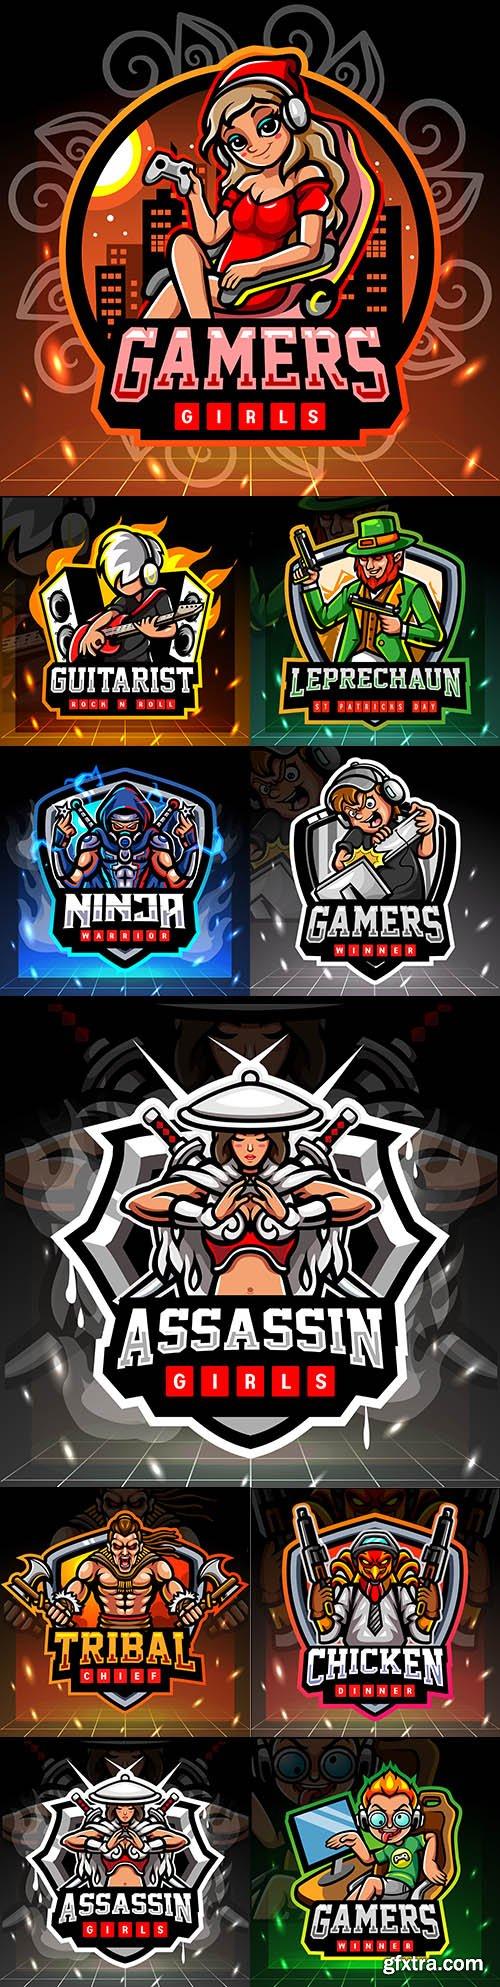 Mascot emblem gaming design cybersport illustration